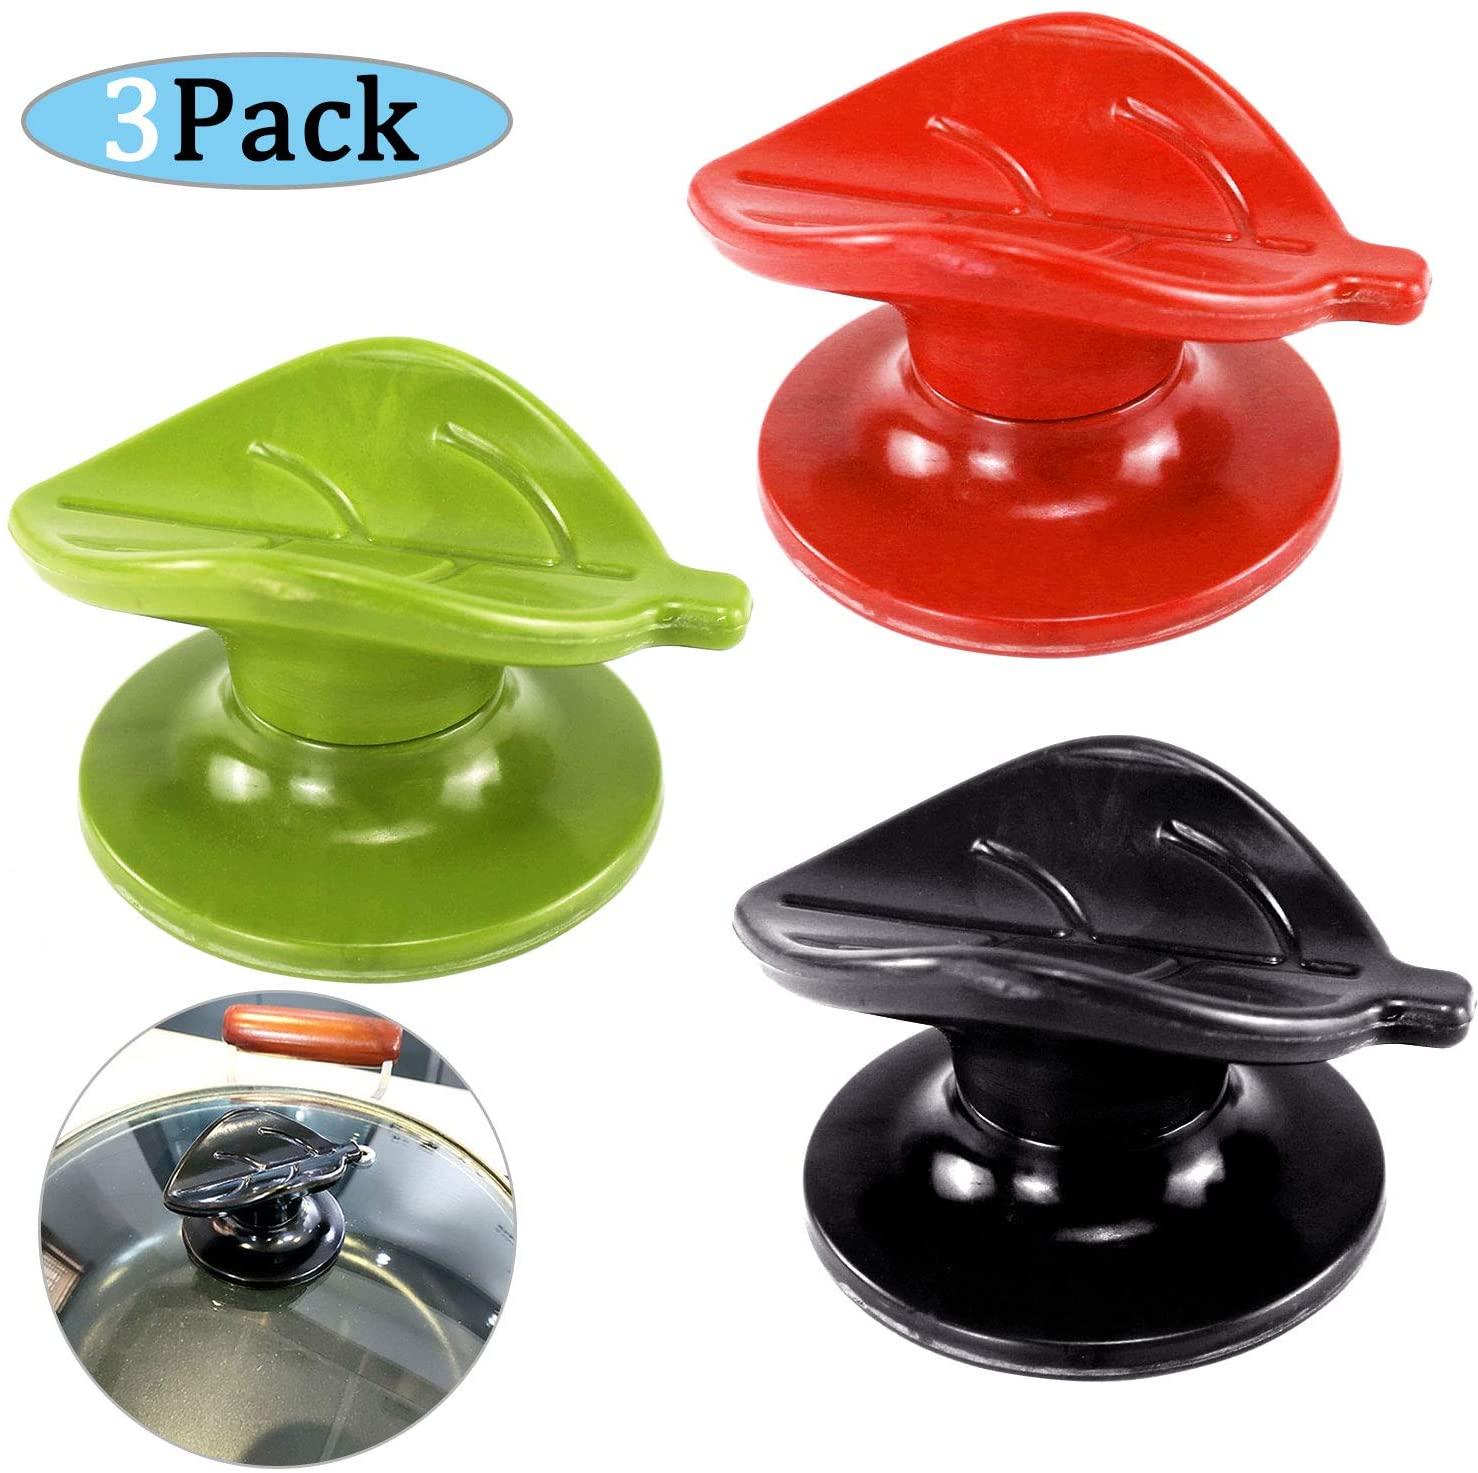 Cookware Lid Knob Handle, Kitchen Universal Casserole Glass Lid Pot Knob, Universal Replacement (3 Pack)